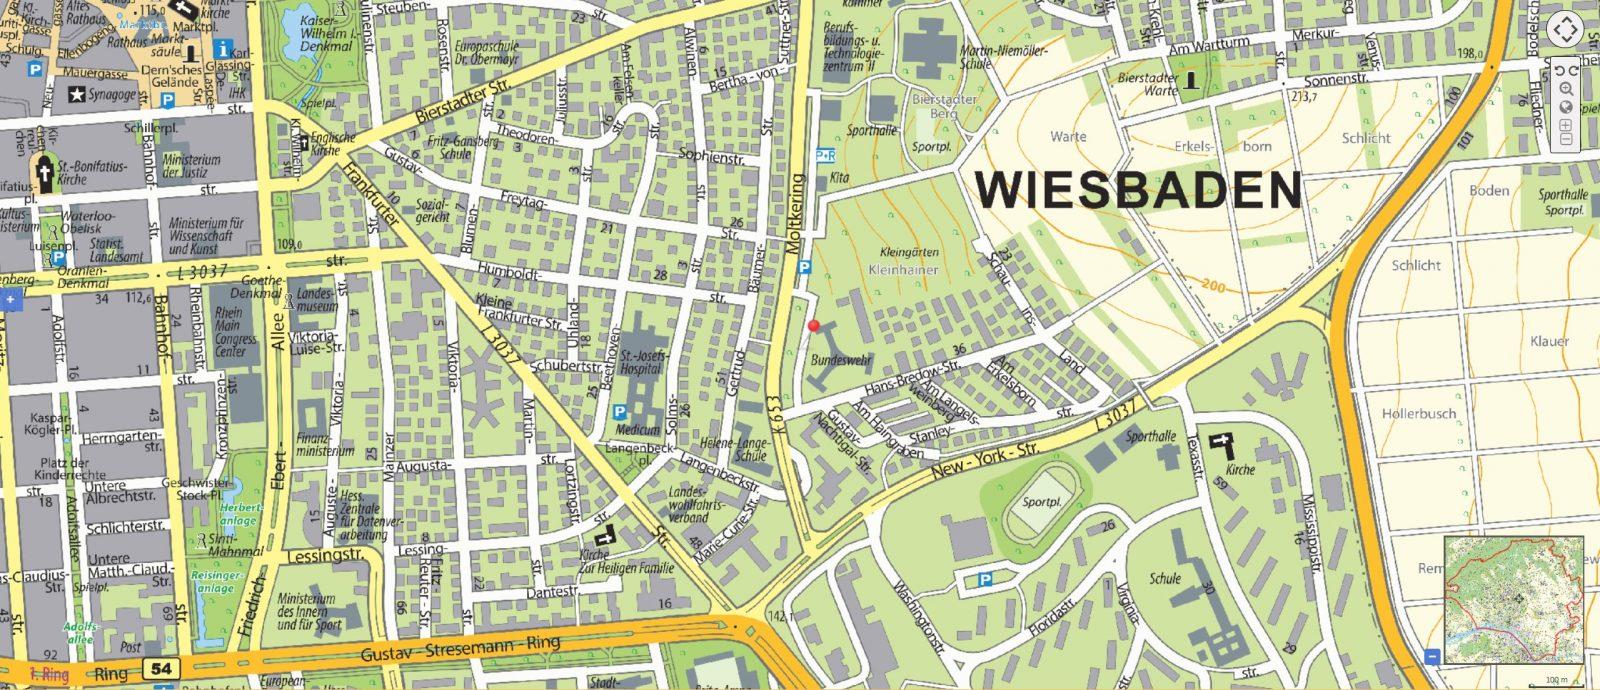 Park Ride Proklima Wiesbaden